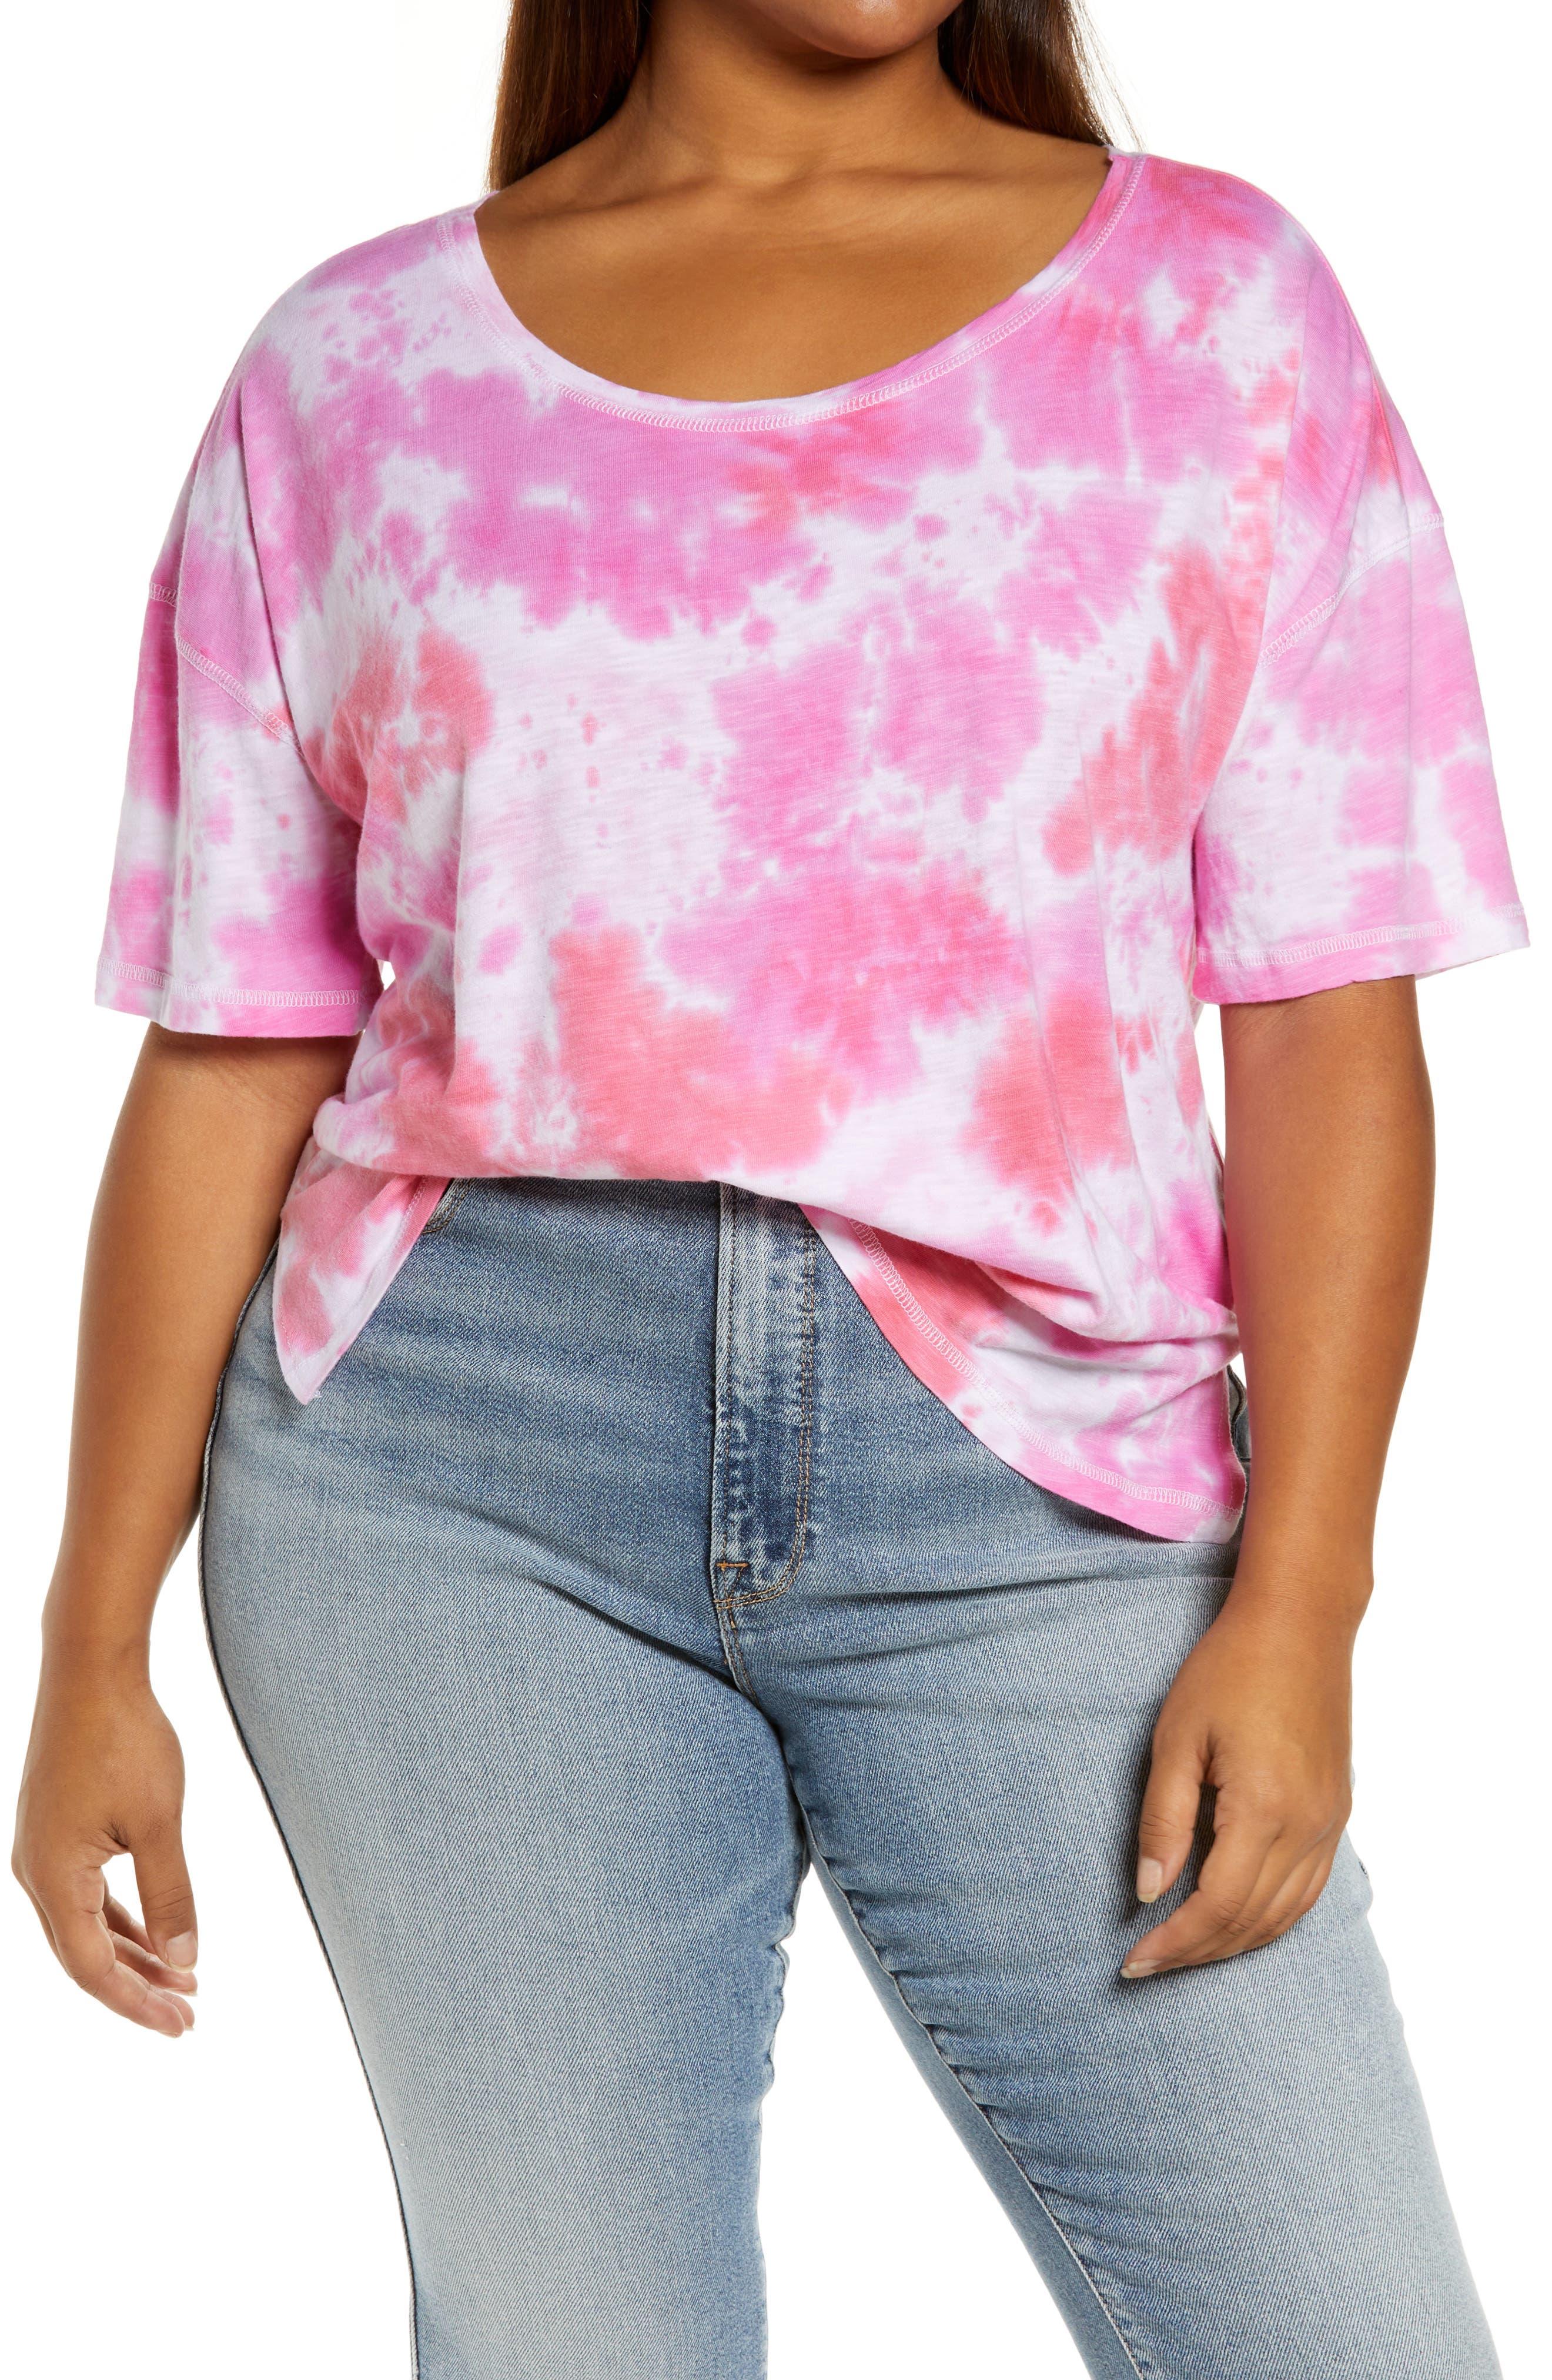 Scoop Neck Boxy T-Shirt